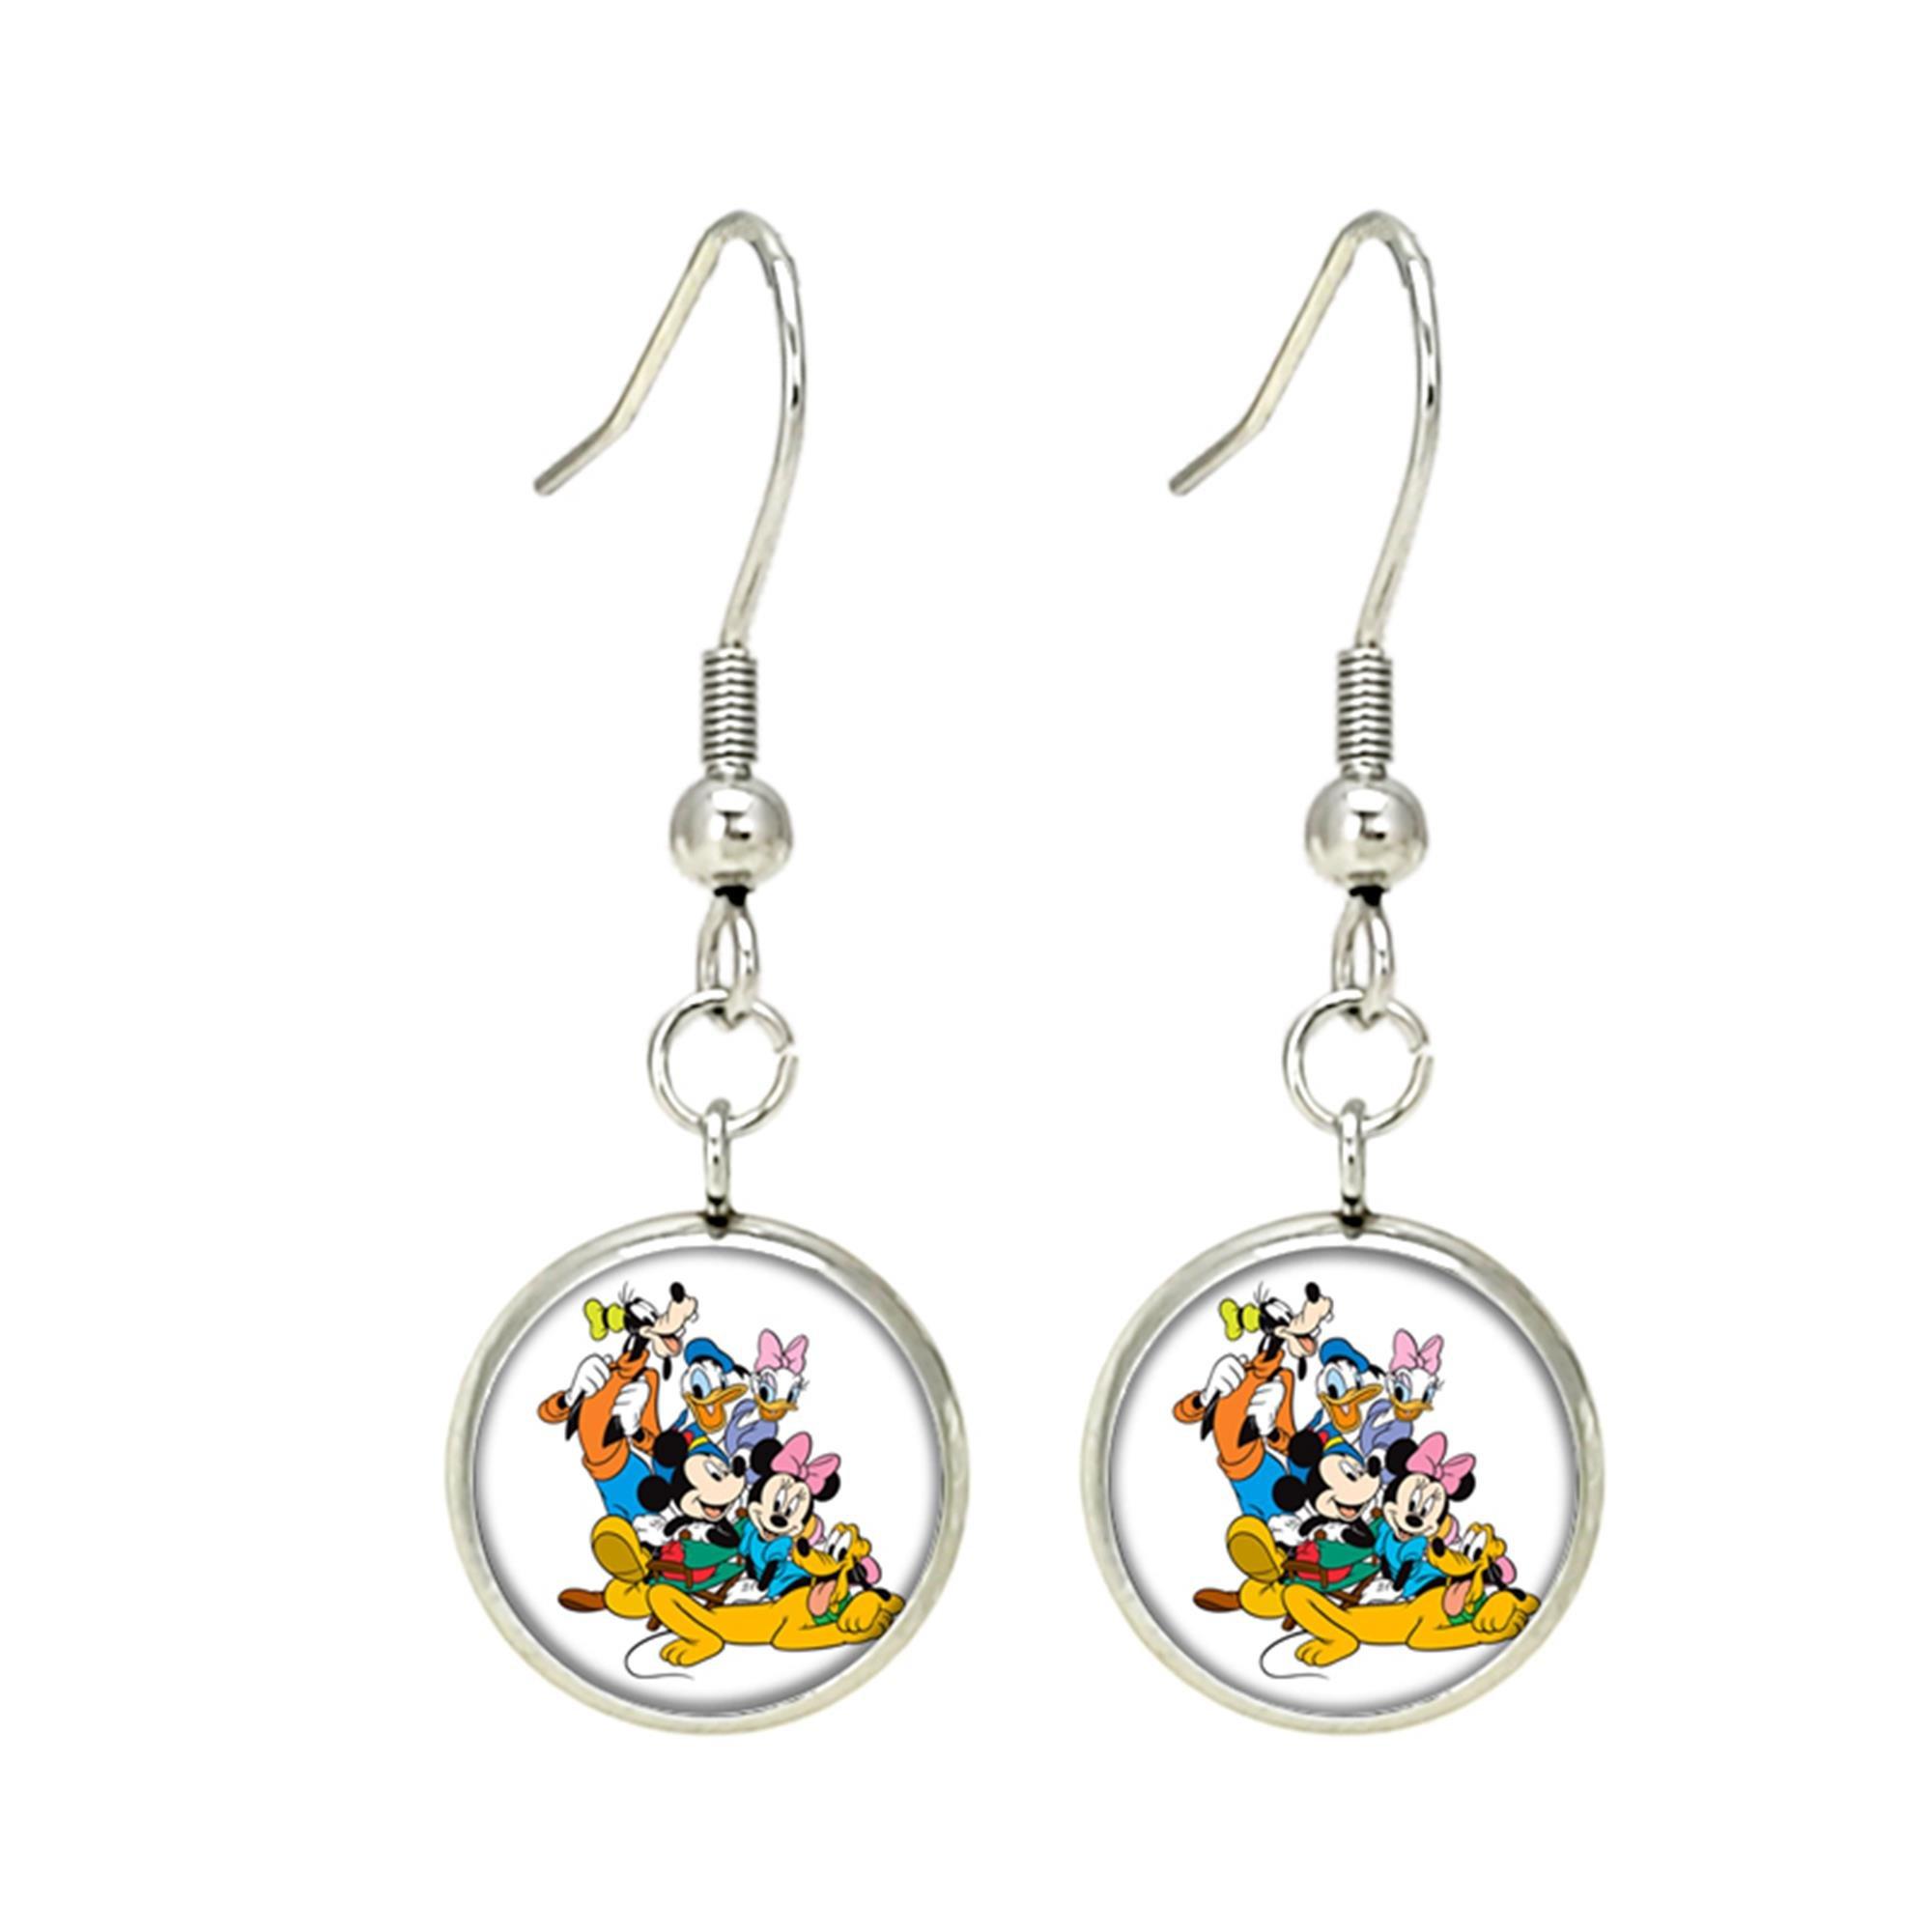 Mickey Mouse Disney Dangle Earrings TV Movies Classic Cartoons Superhero Logo Theme Minnie Donald Daisy Goofy Pluto Premium Quality Detailed Cosplay Jewelry Gift Series